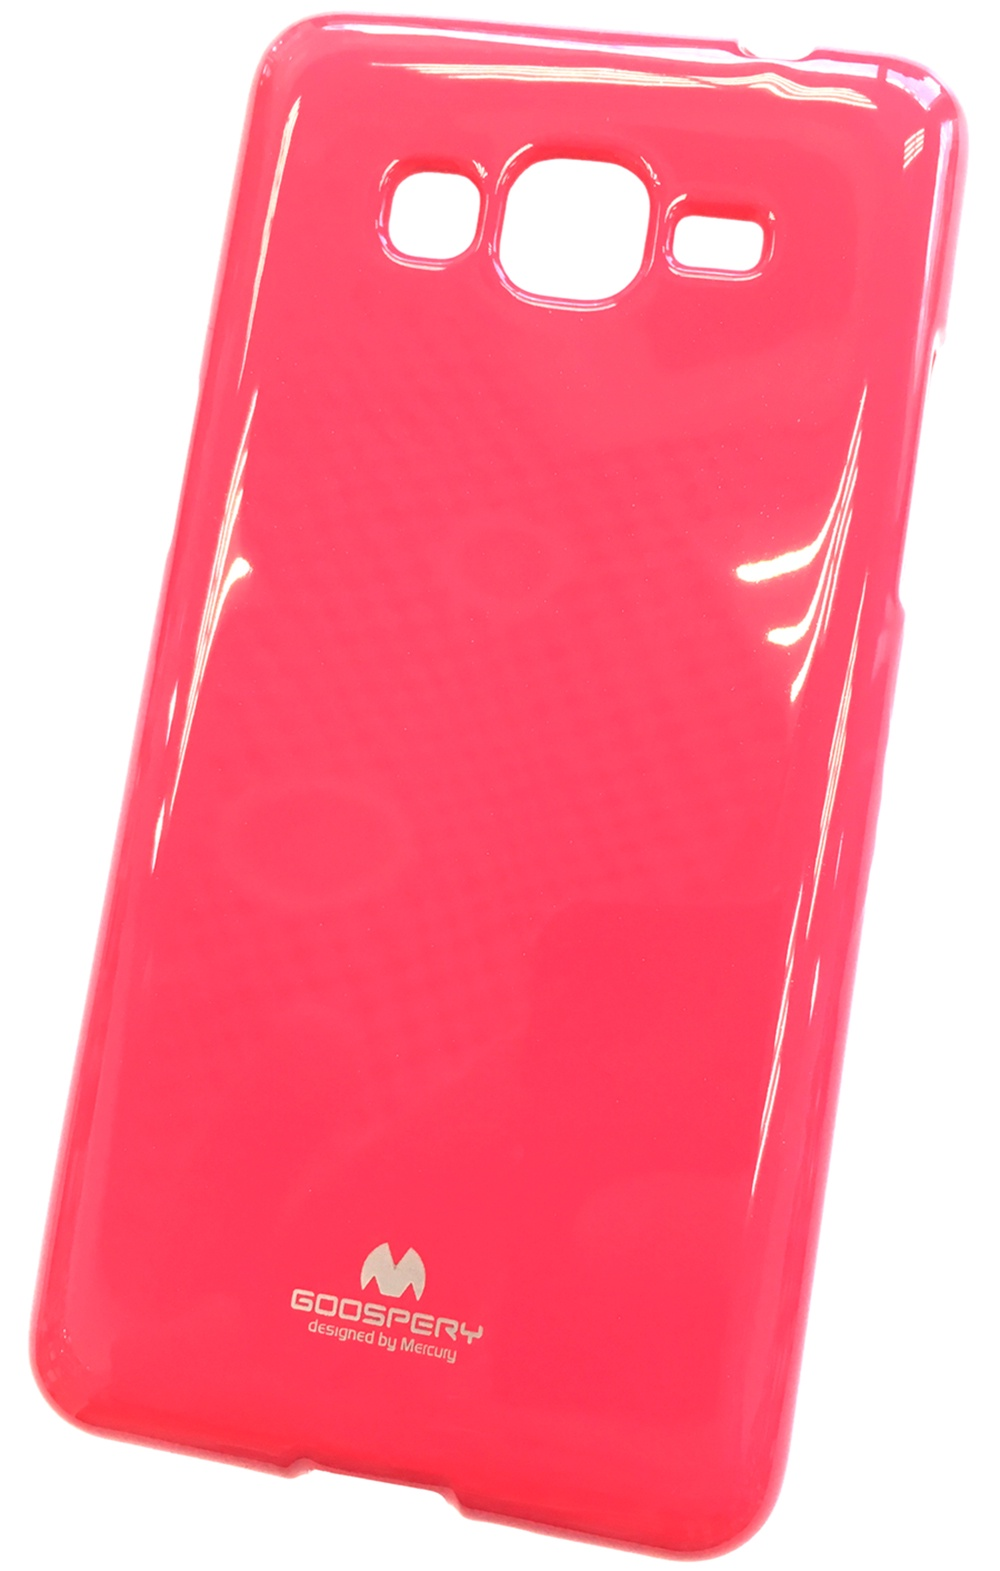 Чехол для сотового телефона Мобильная мода Samsung Grand Prime G530/ J2 Prime Накладка силиконовая Jelly Case чехол для сотового телефона мобильная мода samsung grand prime g530 j2 prime накладка силиконовая jelly case